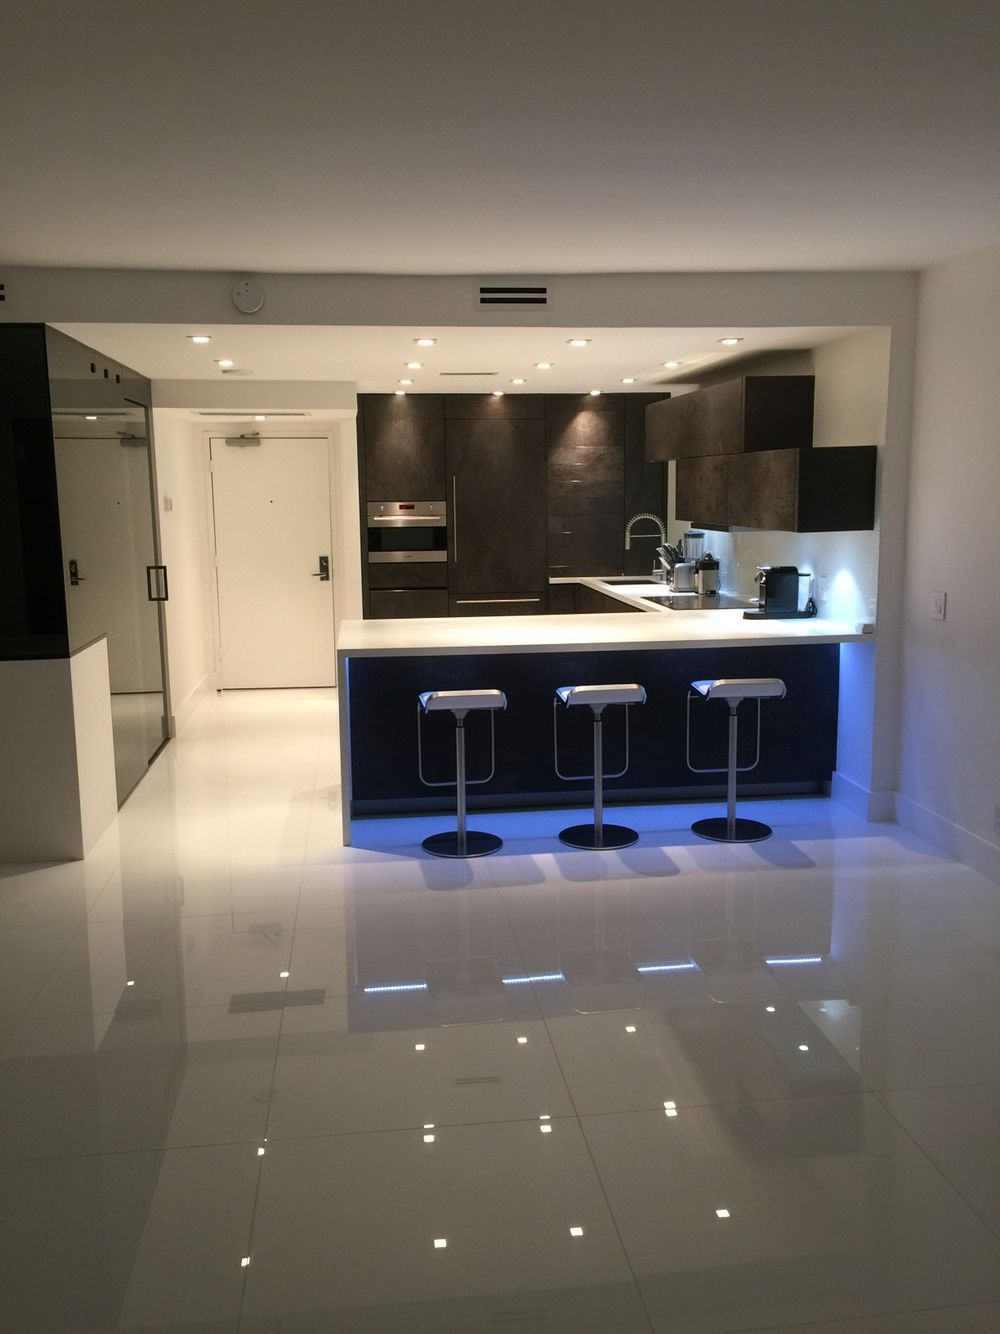 Vision Miami Studio Apt Diseno De Interiores De Cocina Diseno